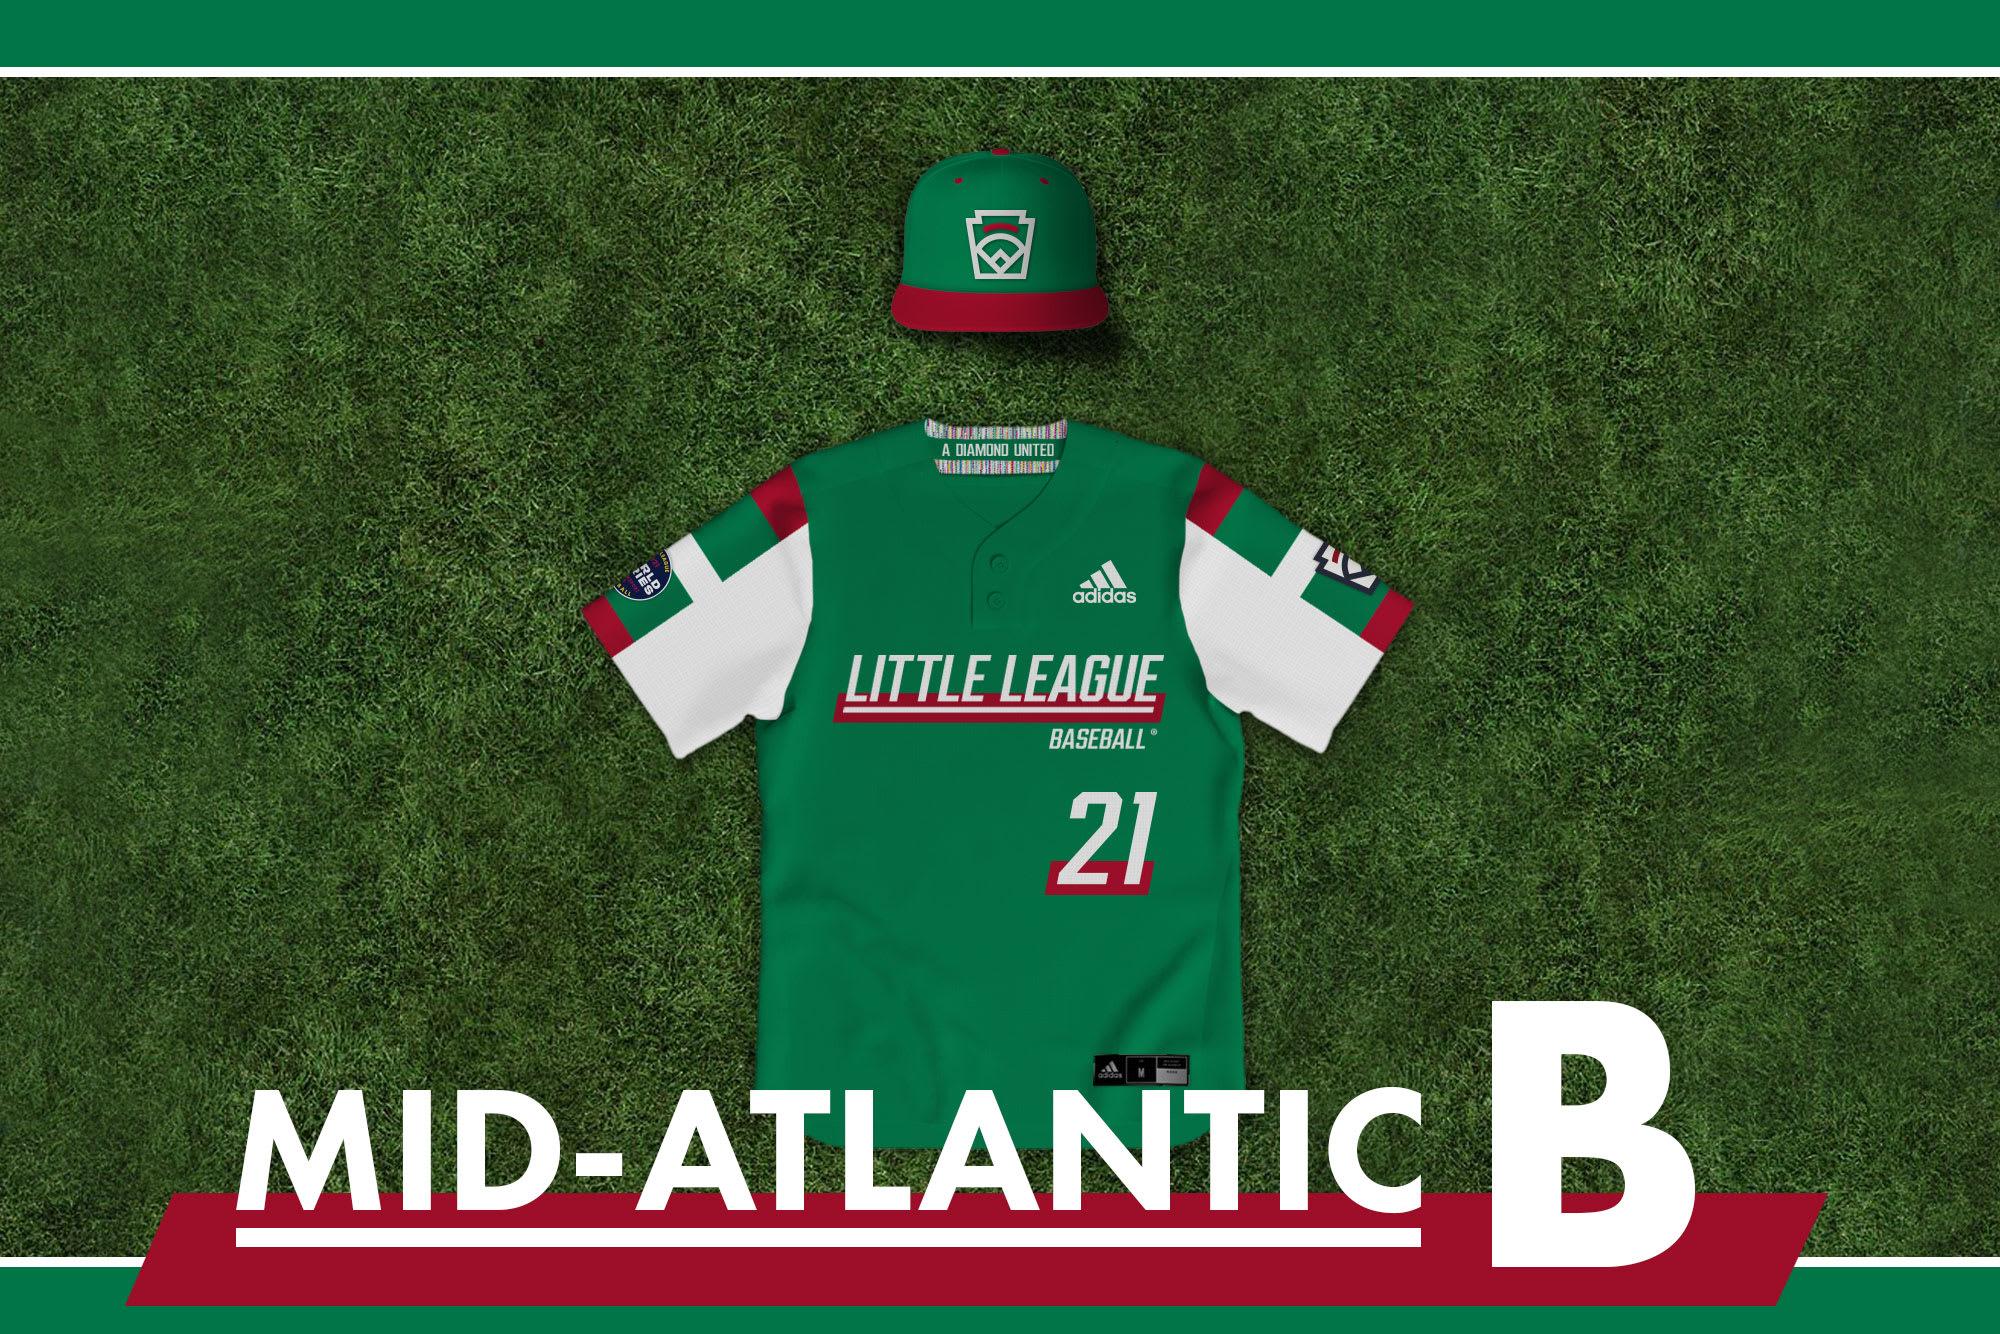 LLB Mid-Atlantic B uniform